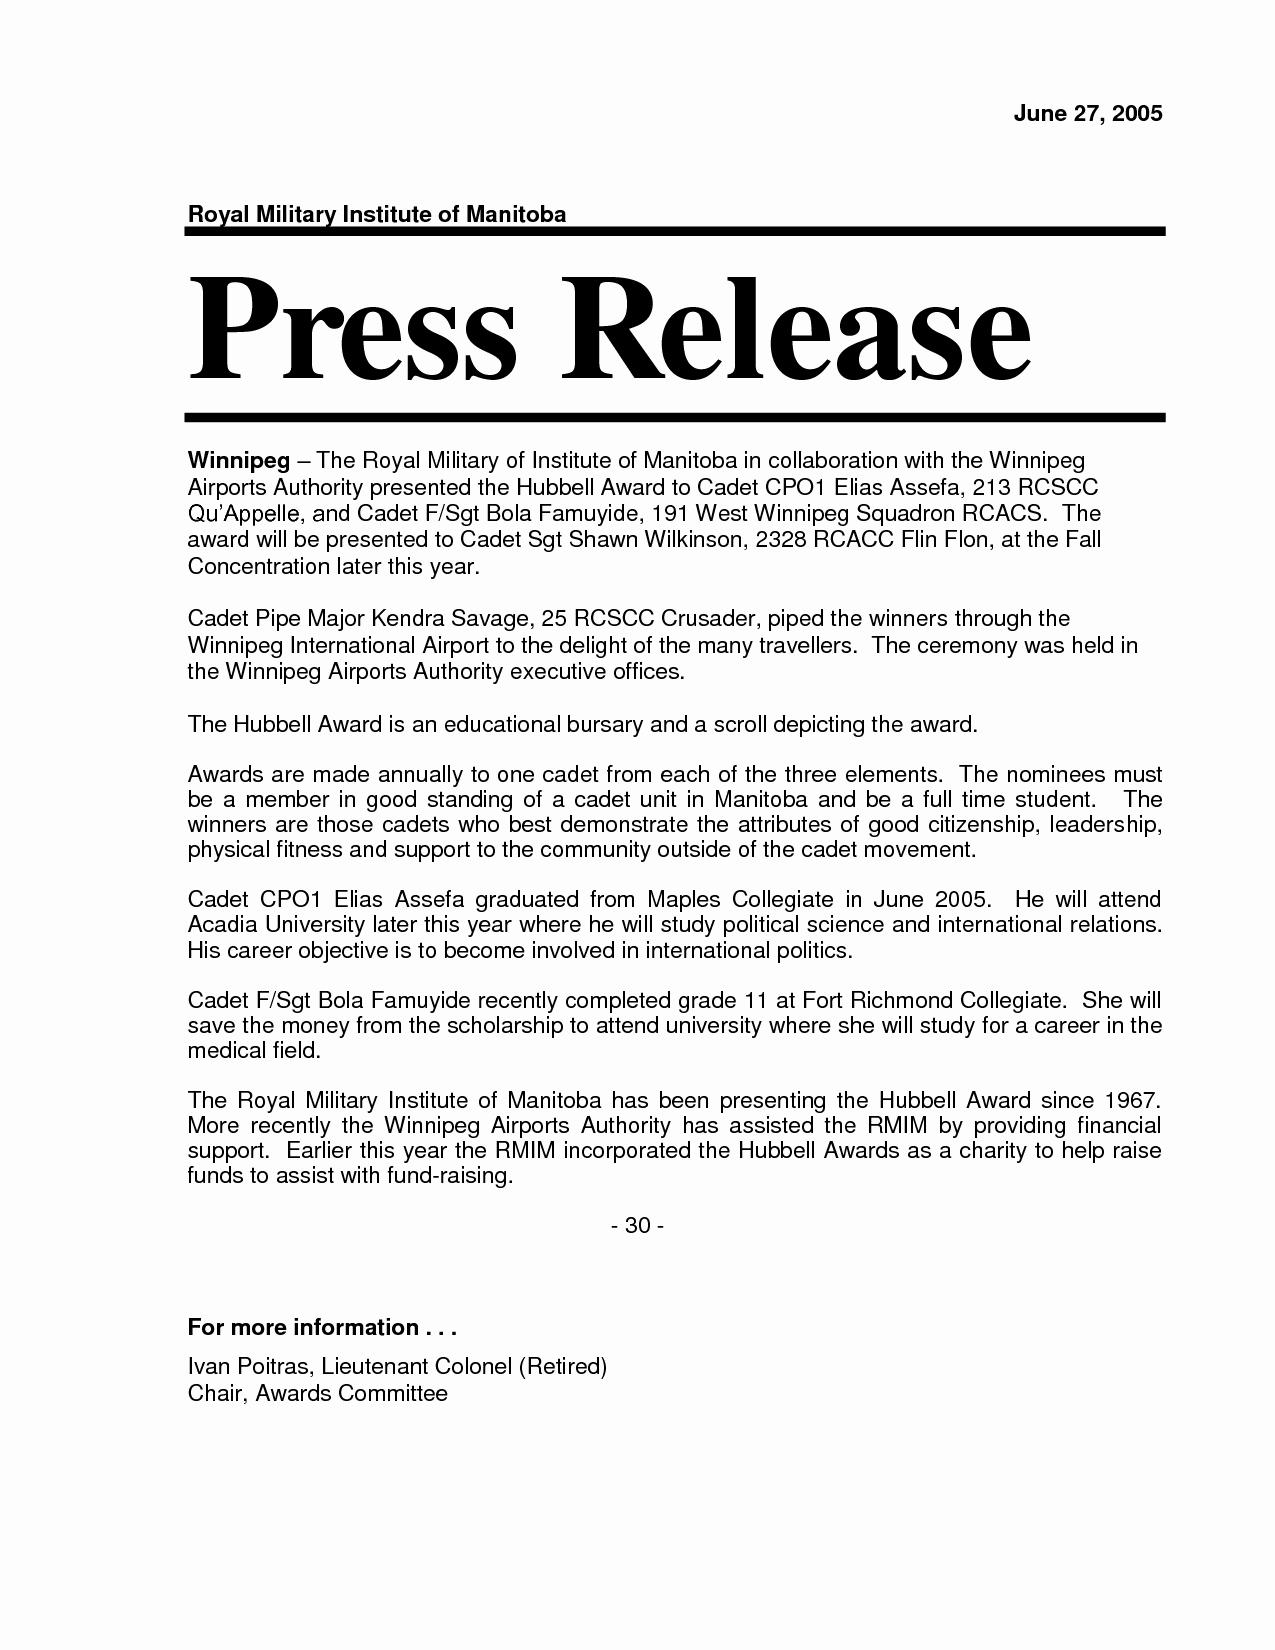 Free Press Release Template Word Luxury Release Press Release Template